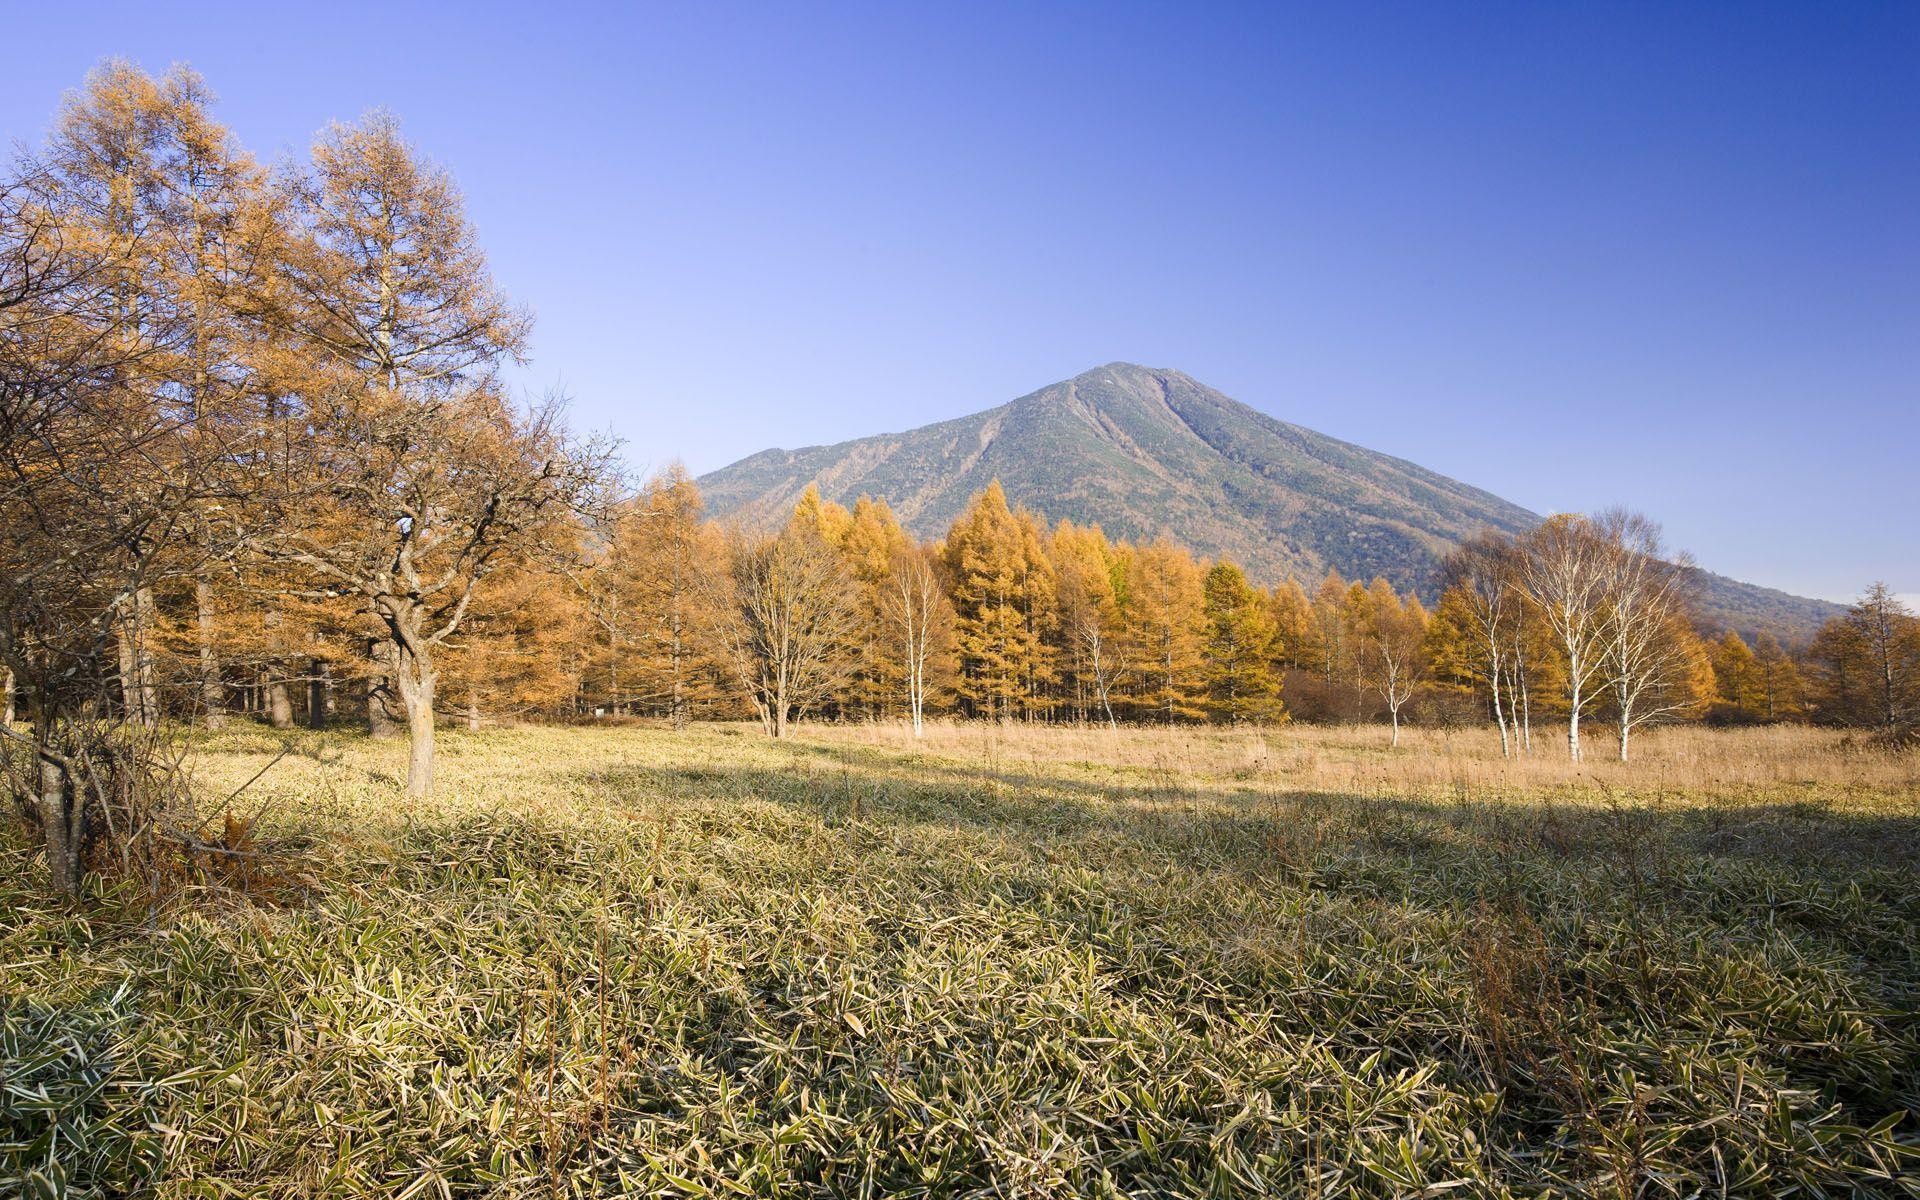 Hokkaido wallpaper - 984535